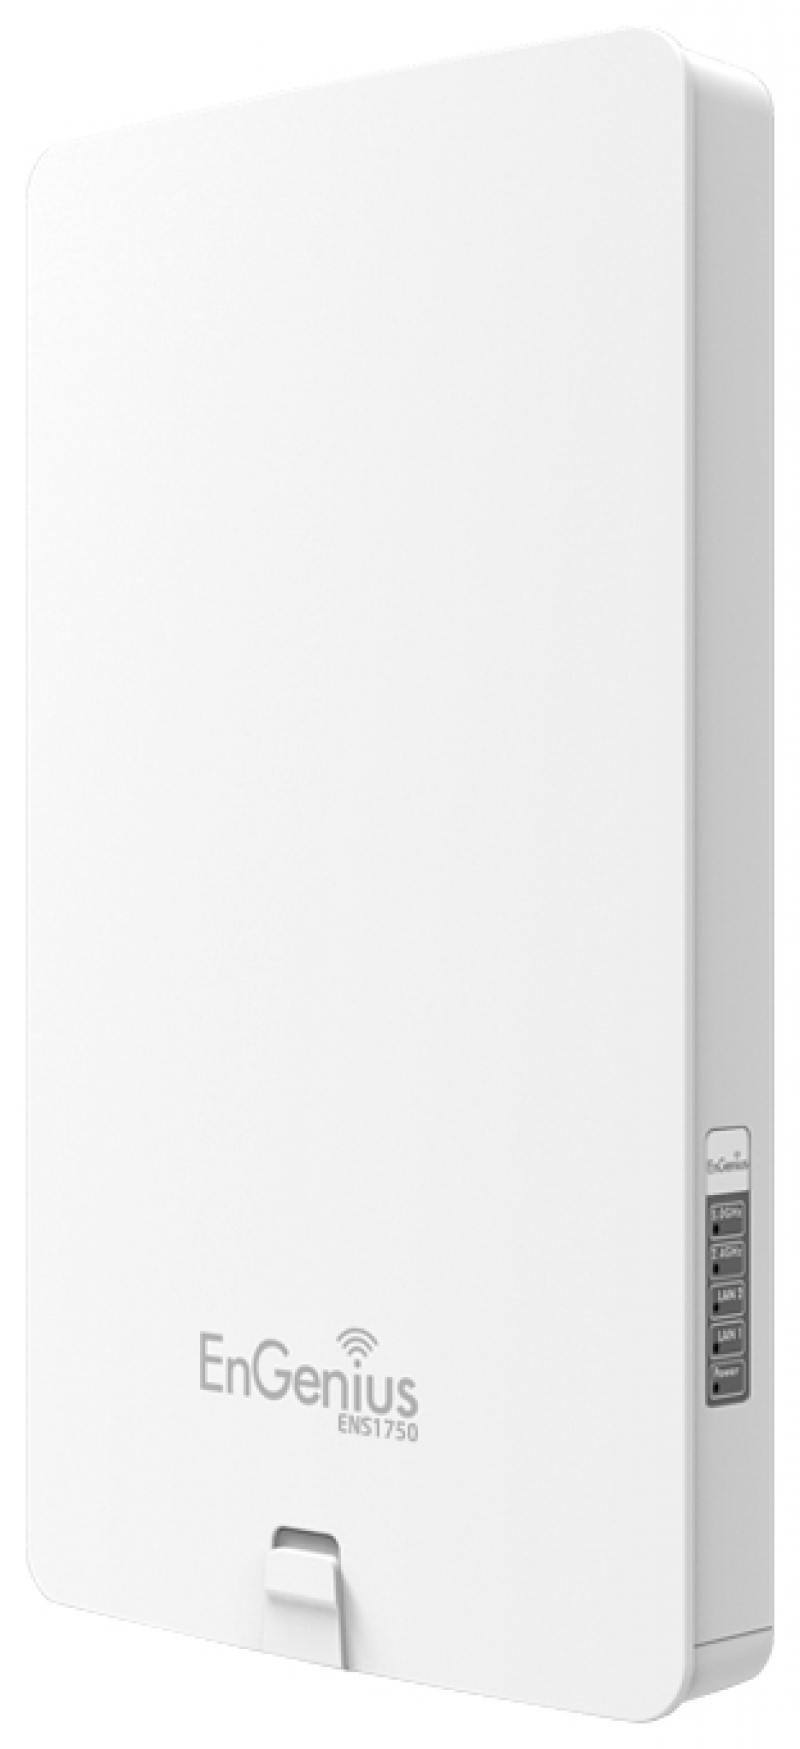 Точка доступа EnGenius ENS1200 802.11aс 866Mbps 5 ГГц 2.4 ГГц 2xLAN белый